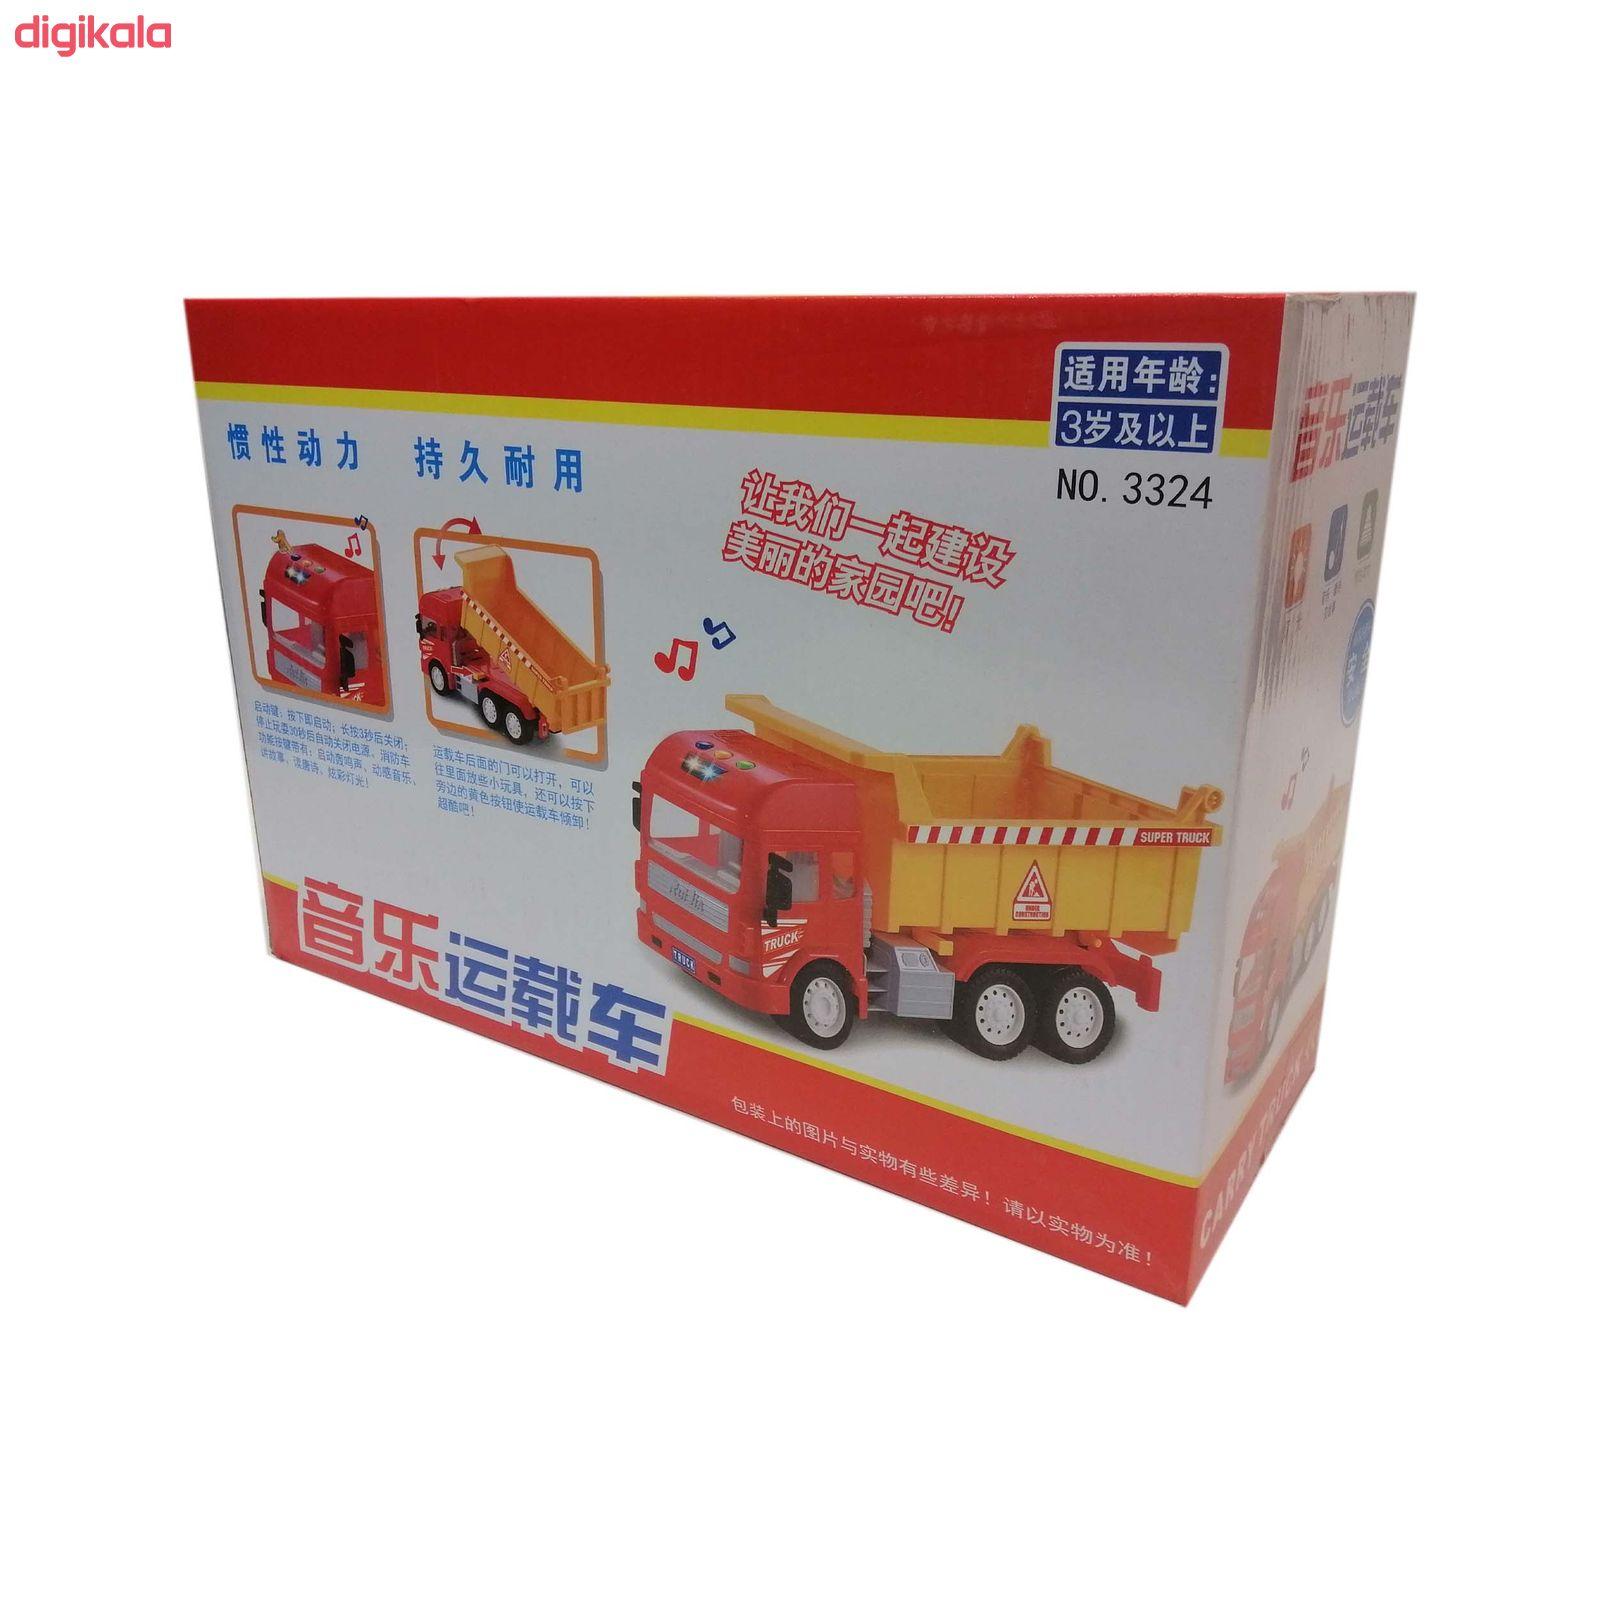 ماشین بازی جین لینگ گوو طرح کمپرسی کد NO.3323